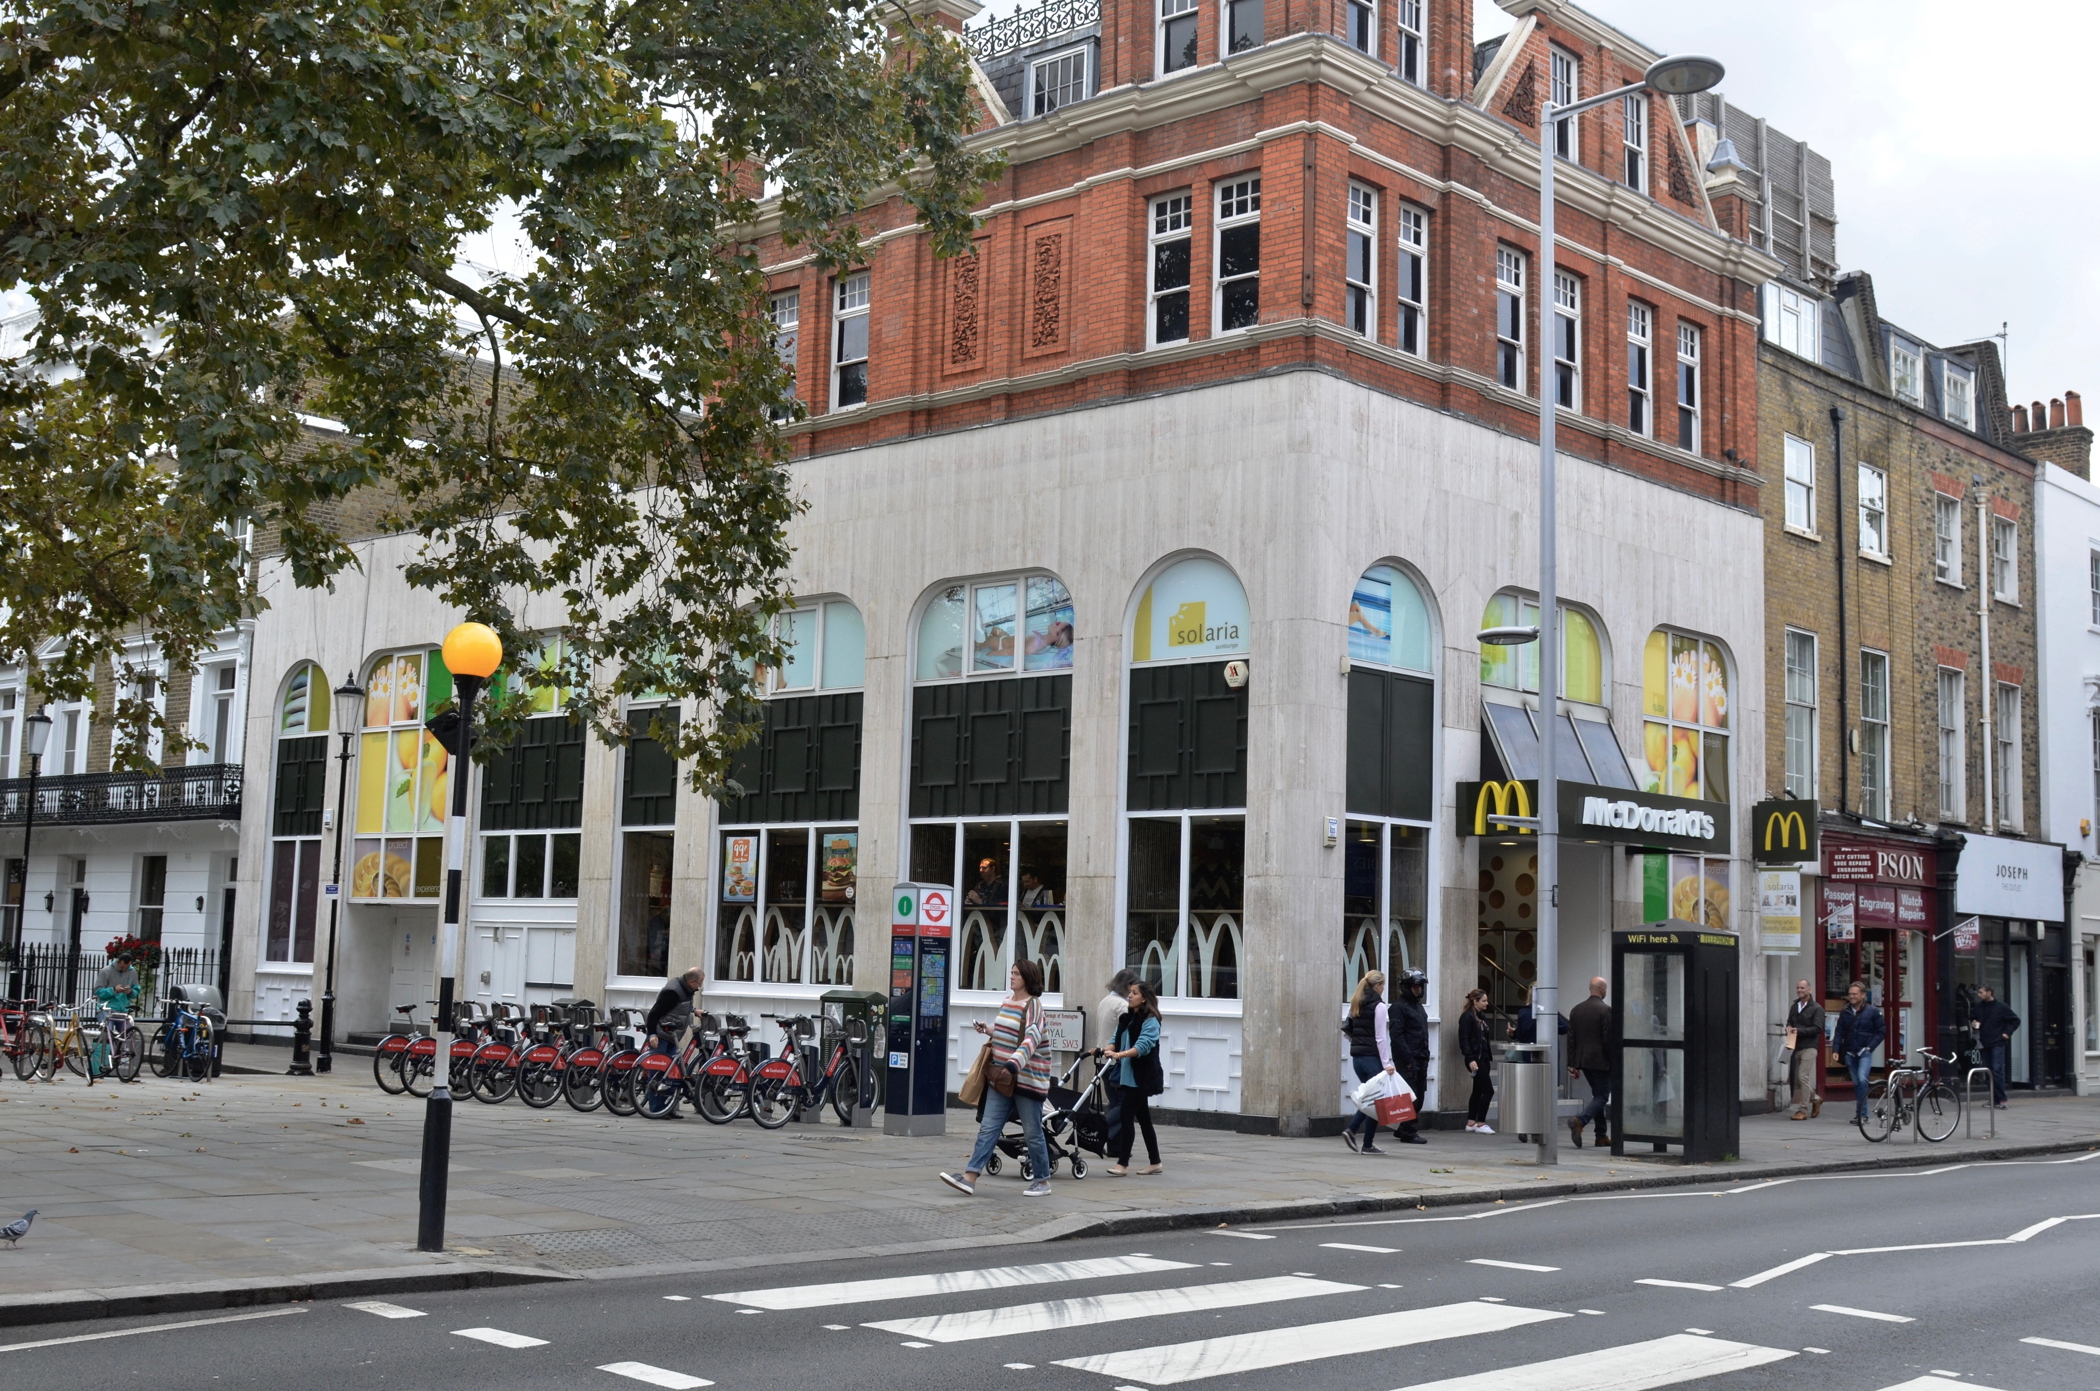 Ehemalihger Chelsea Drug Store im Swinging London